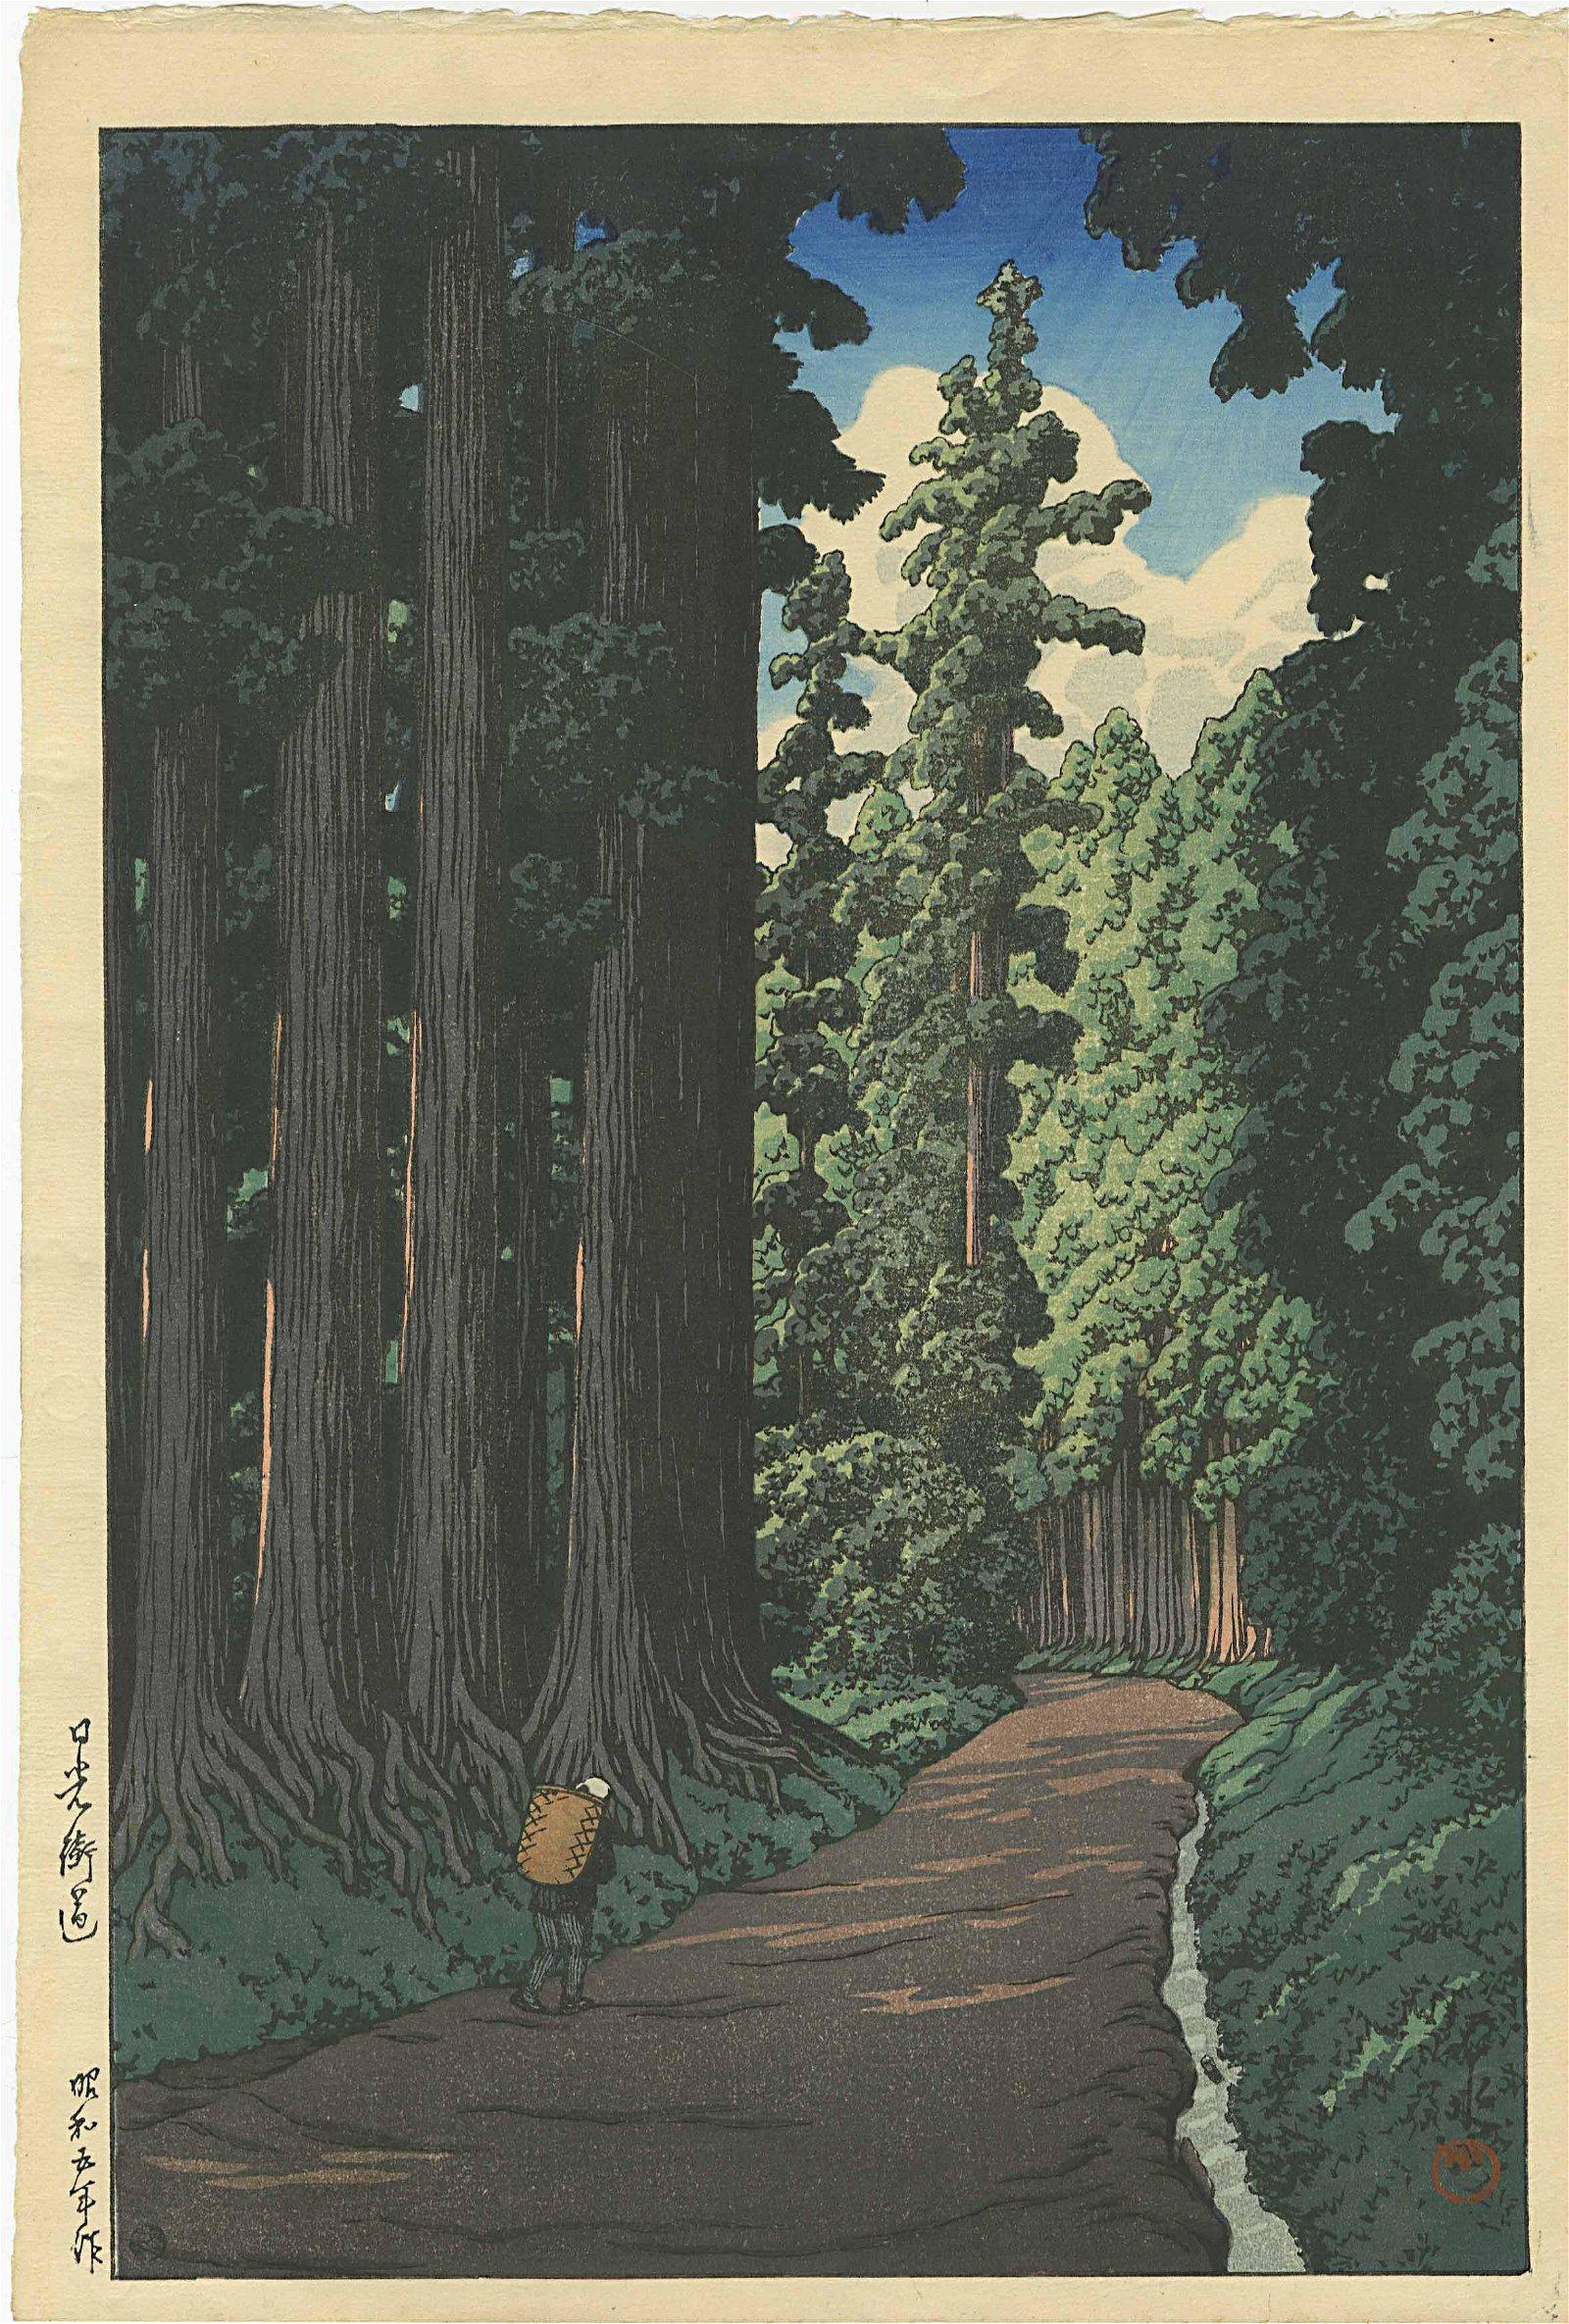 Hasui: Kasuga Shrine Nara 1930 6mm seal Woodblock